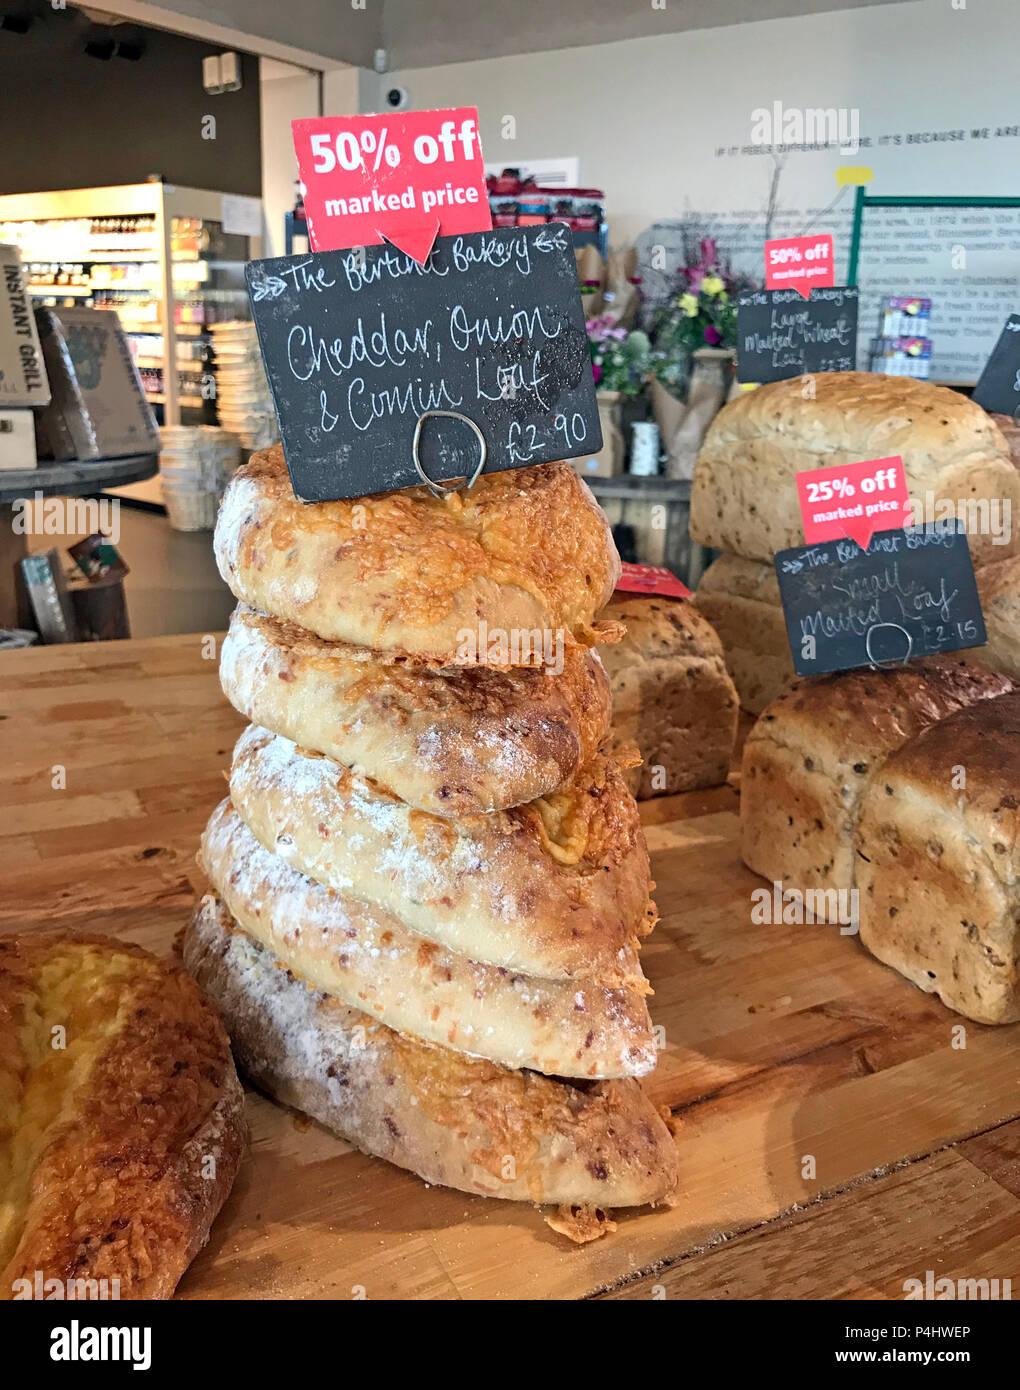 Laden Sie dieses Alamy Stockfoto Artisan Brot, M 5 Gloucester Hofladen Raststätte, Gloucestershire, England, Großbritannien - P4HWEP